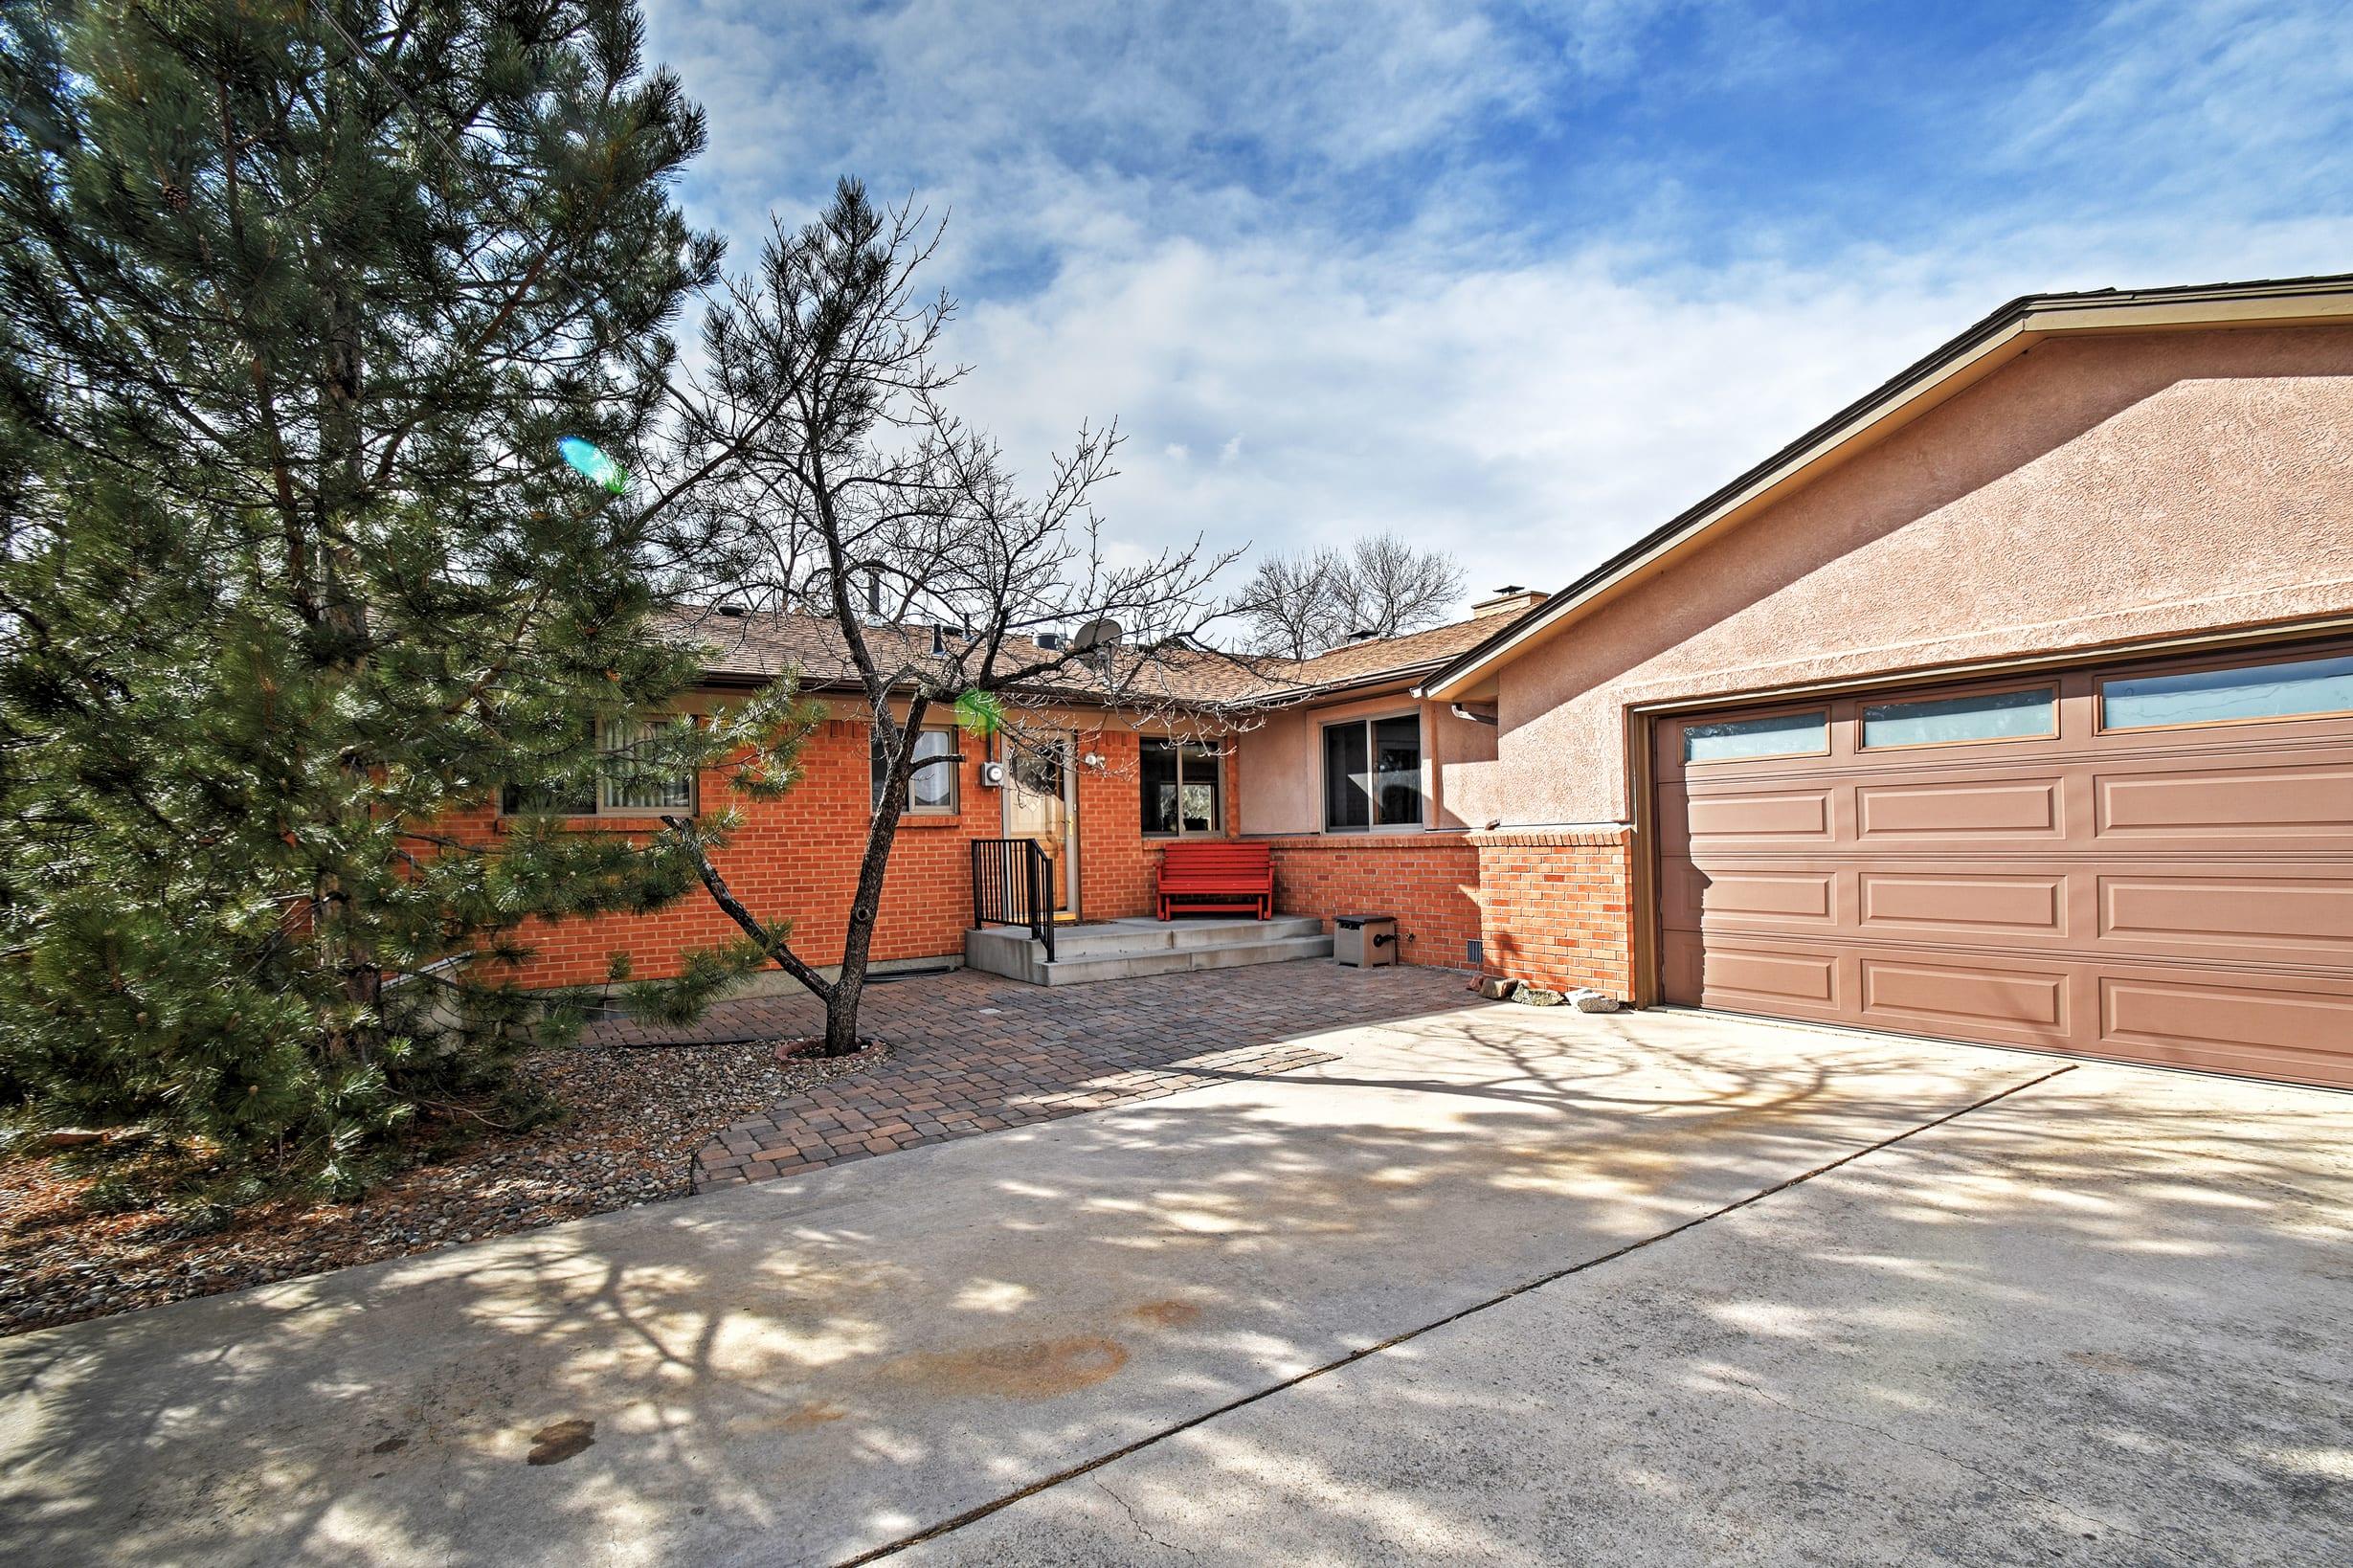 A memorable getaway awaits you at this fantastic Colorado Springs home!